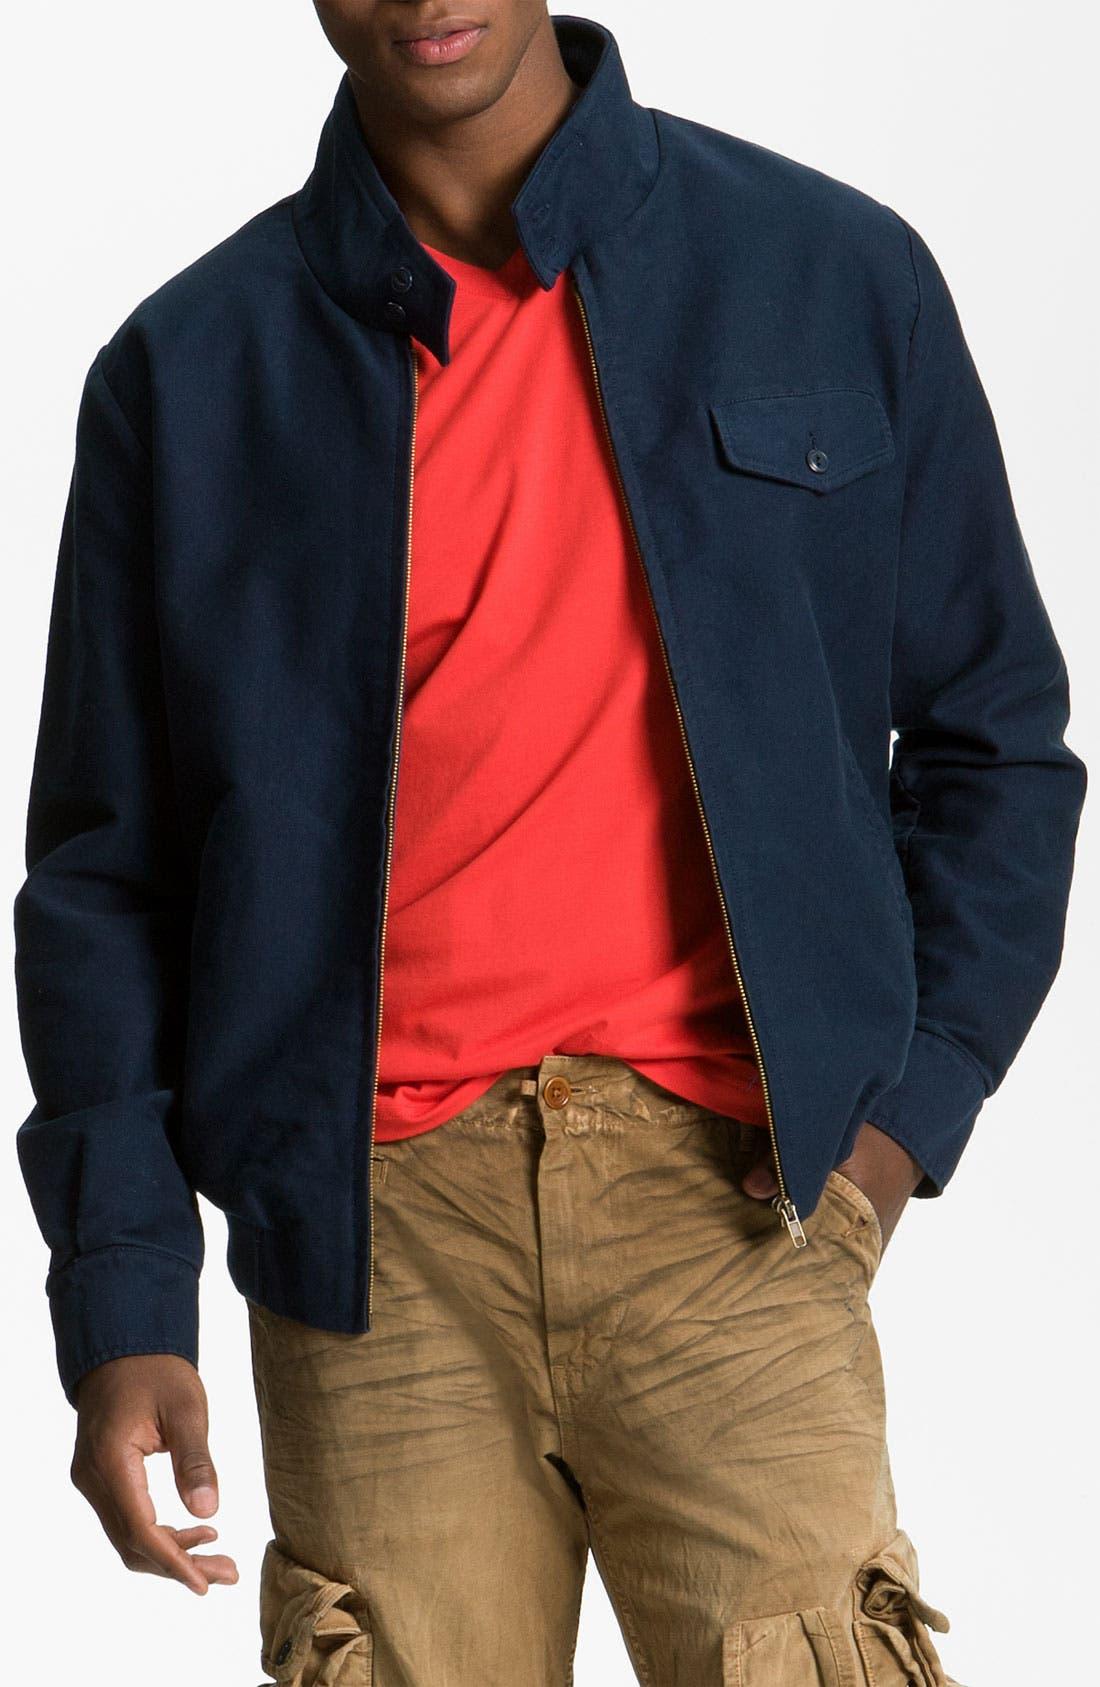 Alternate Image 1 Selected - Penny Stock 'Penny Breaker' Cotton Jacket